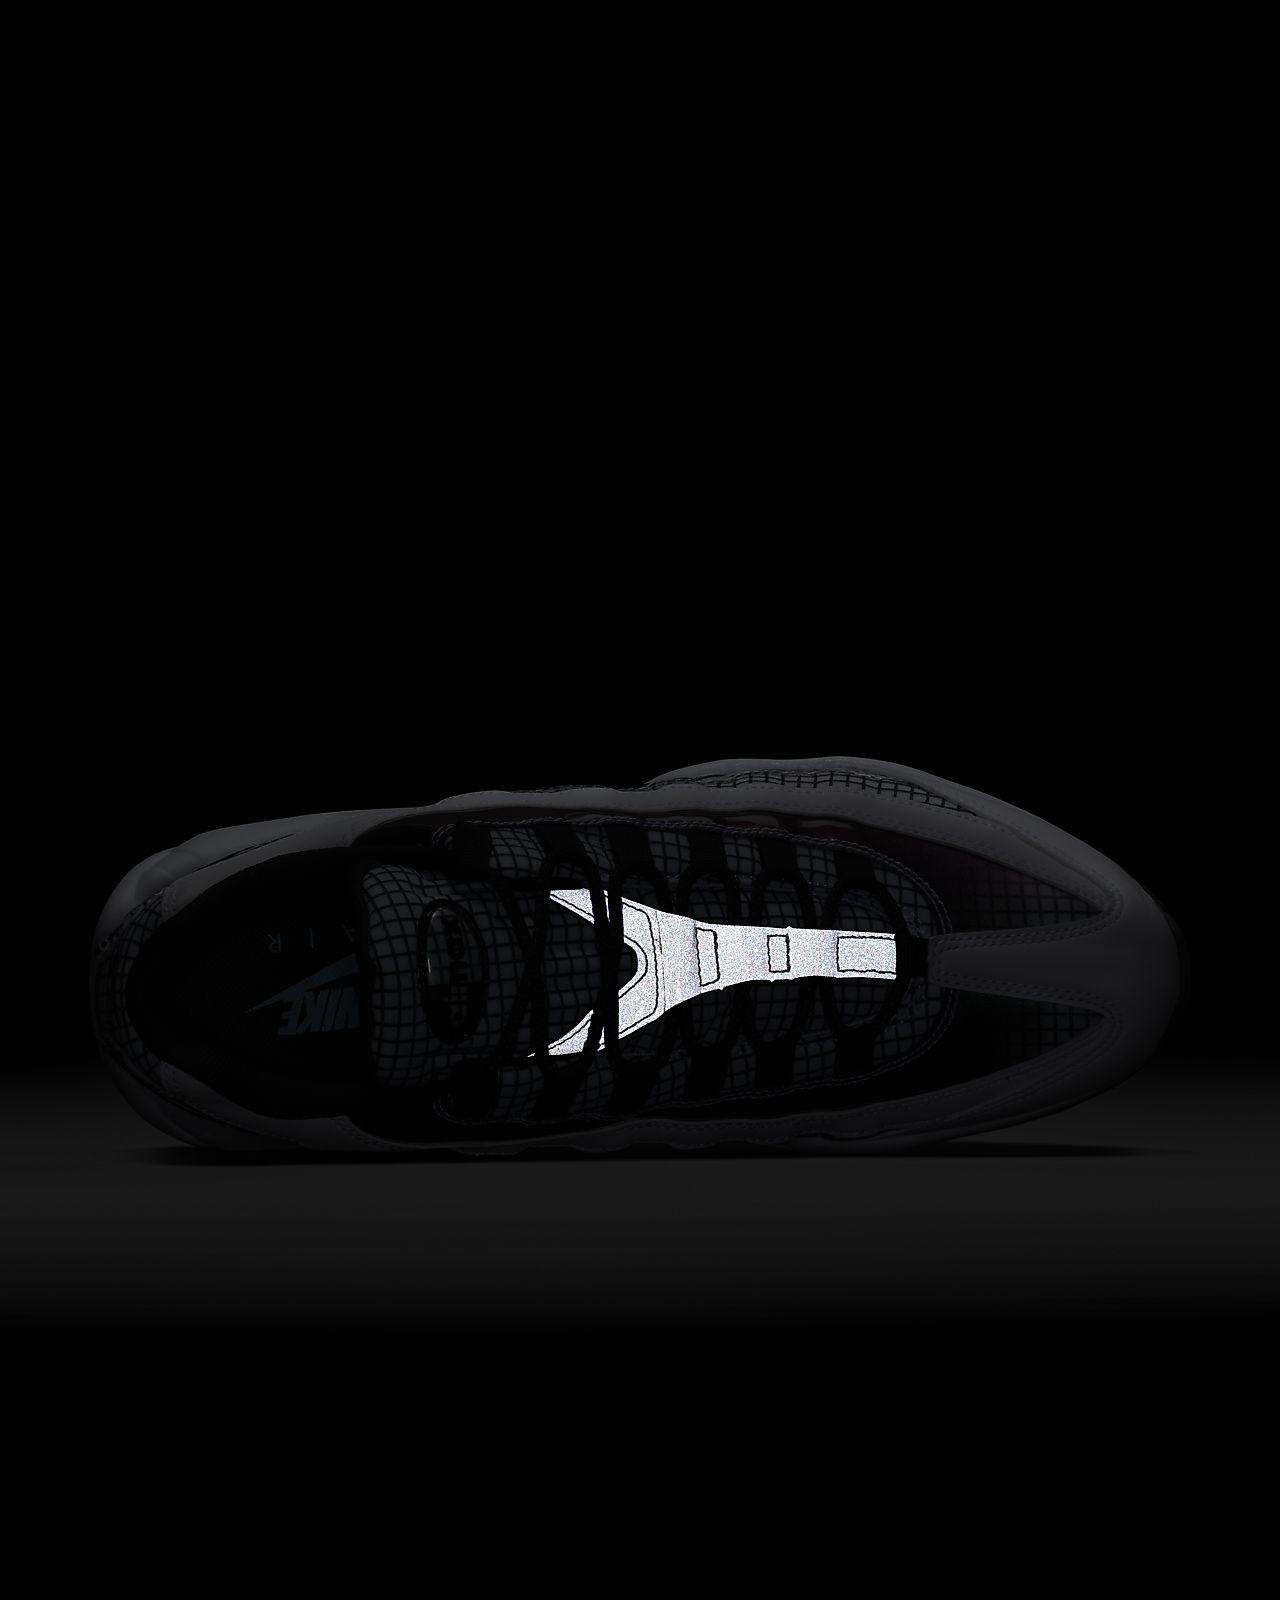 e8075d1856 Nike Air Max 95 LV8 Men's Shoe. Nike.com